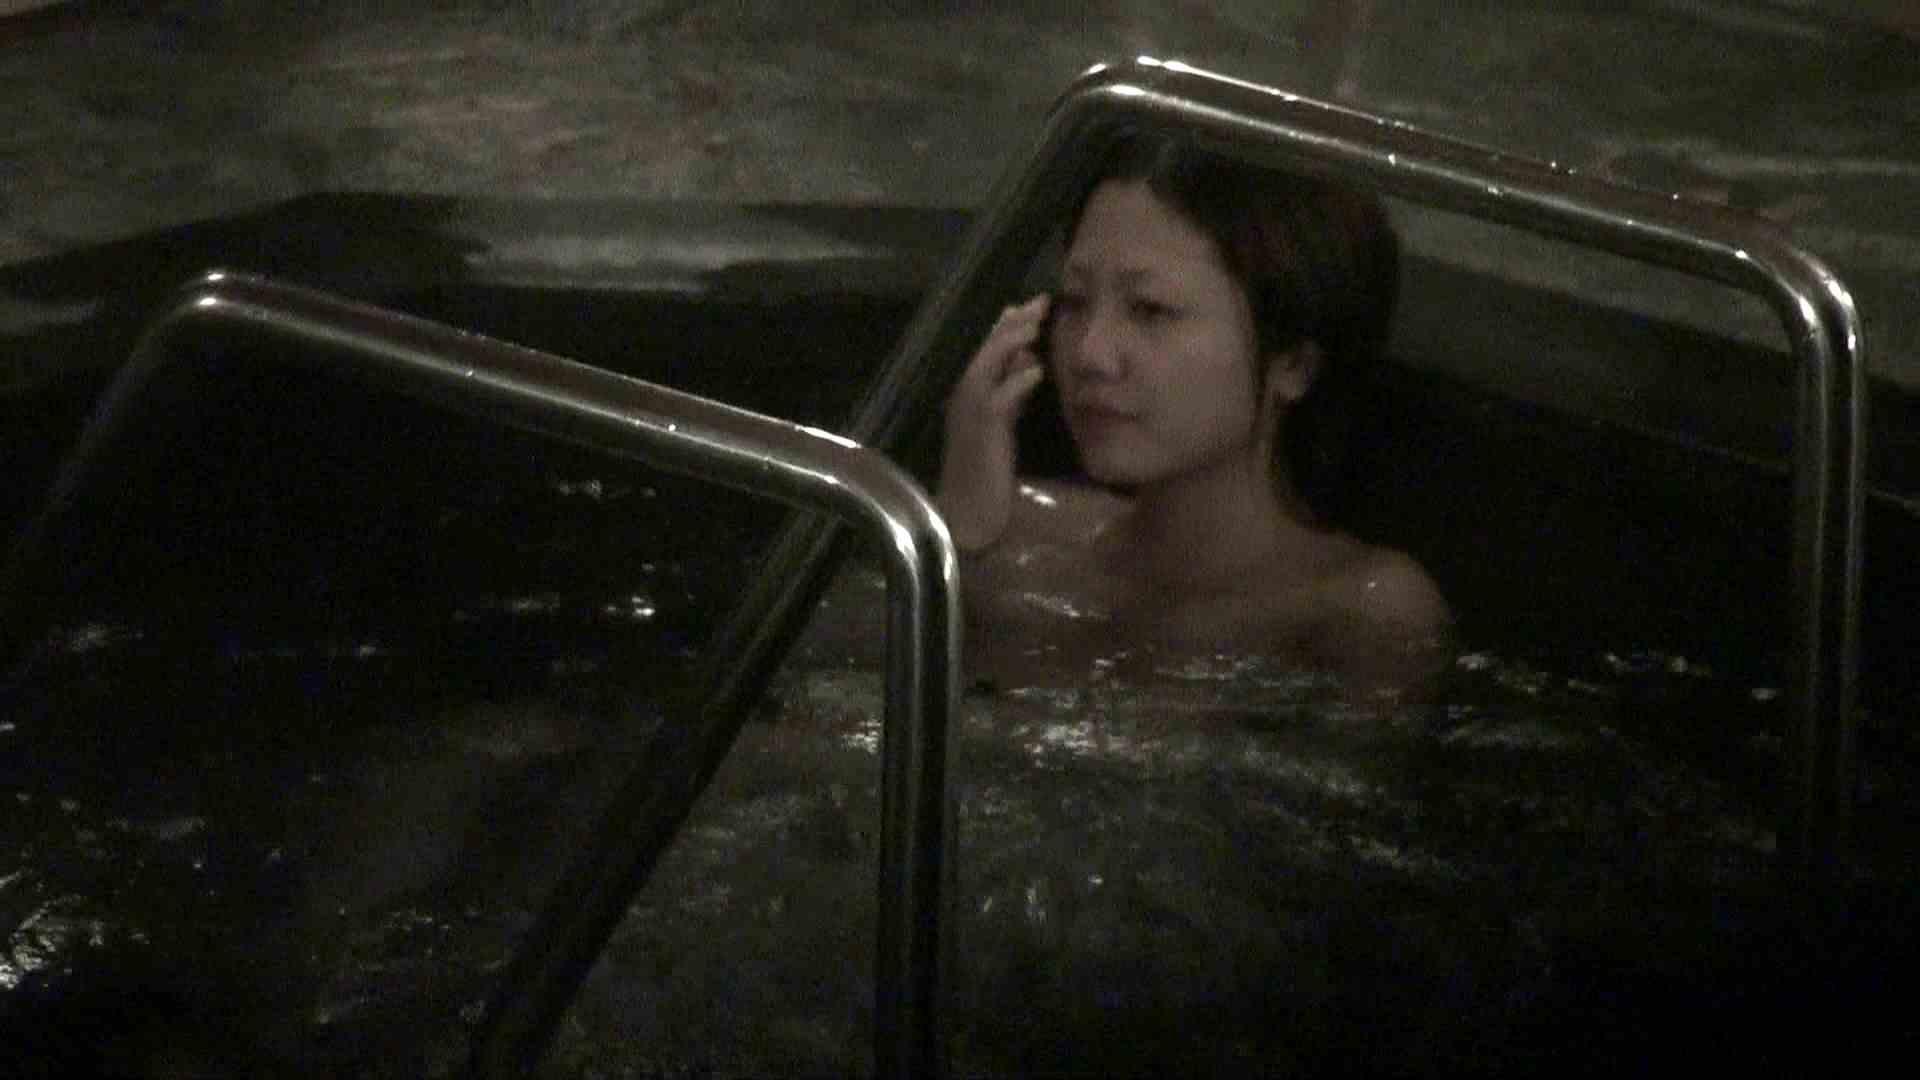 Aquaな露天風呂Vol.411 OLのエロ生活   露天風呂  79連発 61